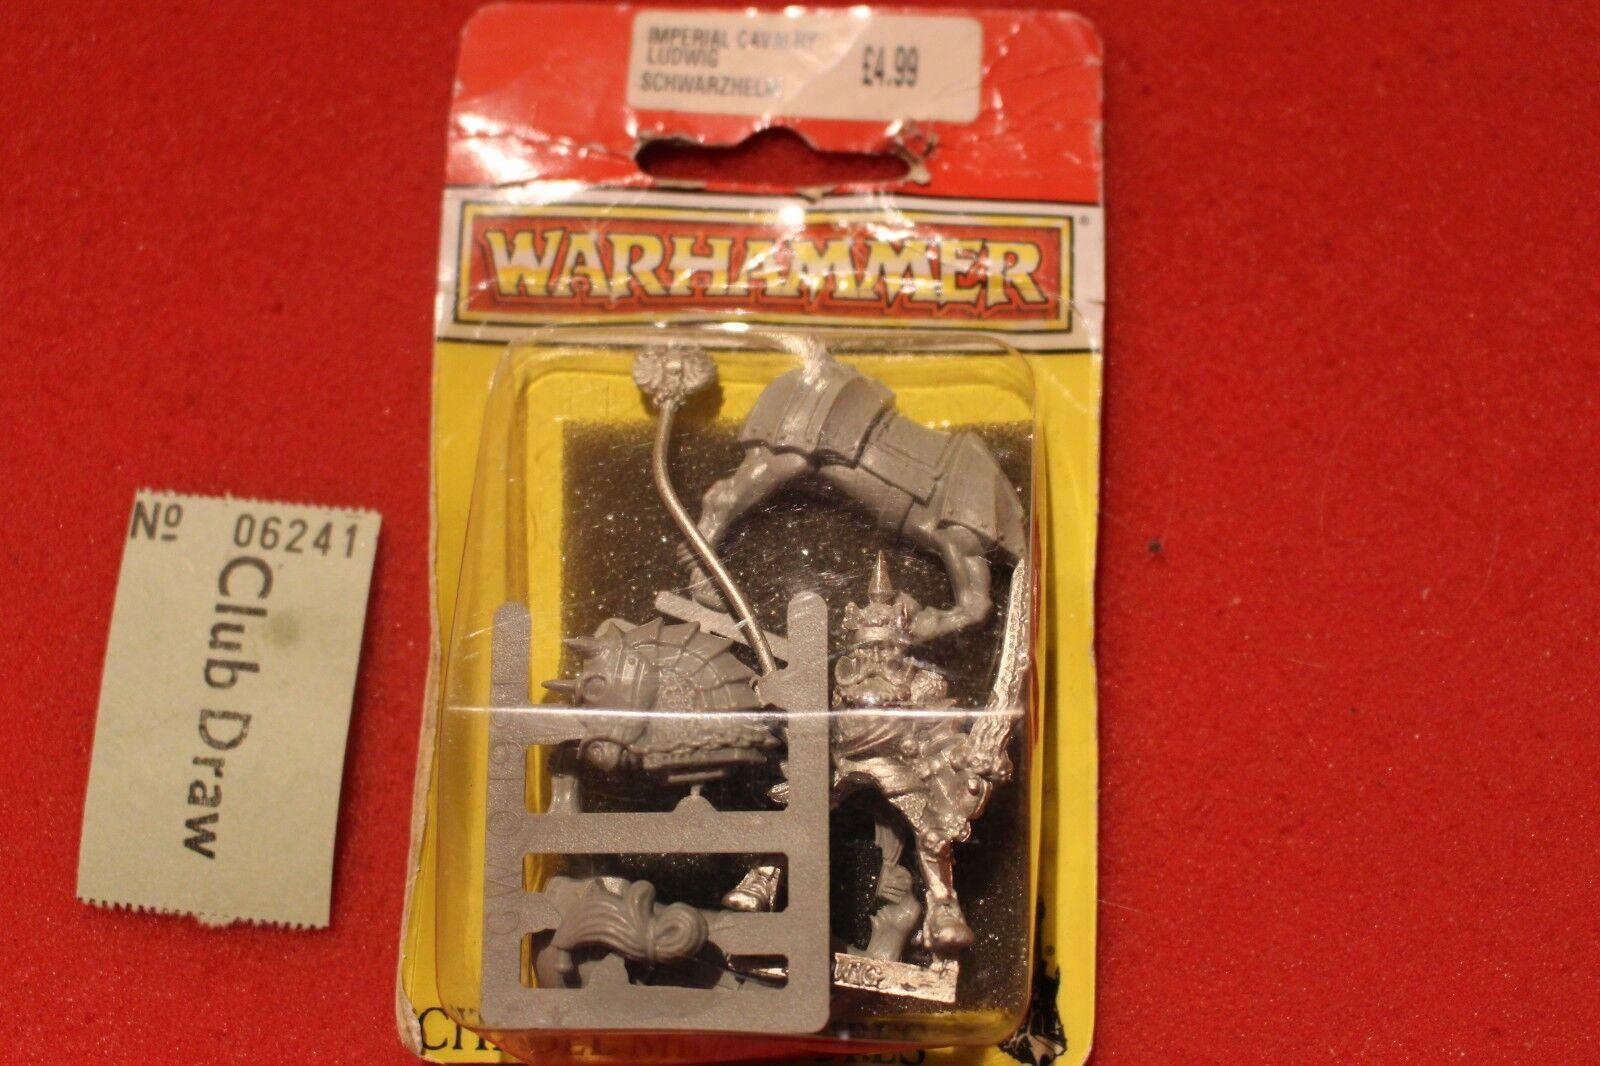 Games workshop warhammer empire ludwig schwarzhelm imperial held bnib metall